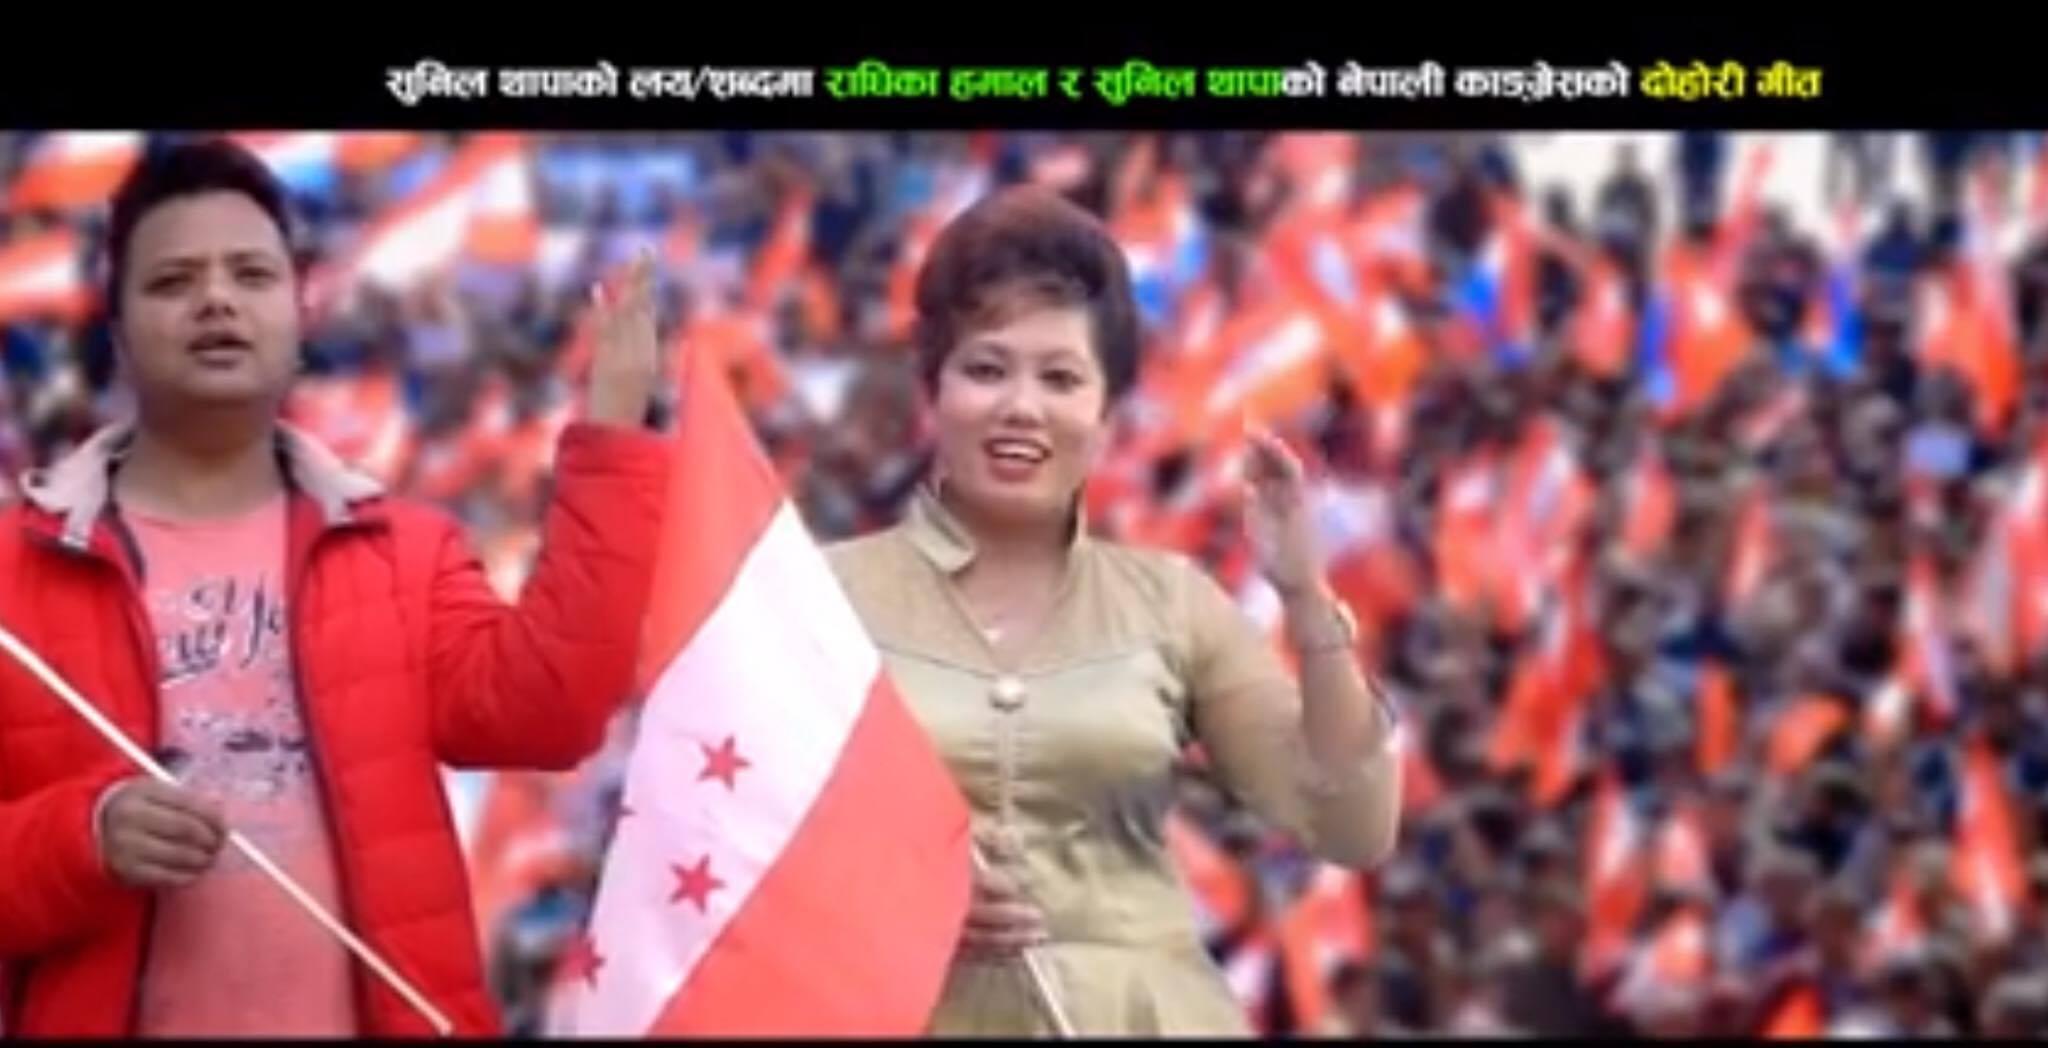 गुल्मेली गायक सुनिल थापाले ल्याए कांग्रेस लक्षित चुनावी गीत (भिडियो सहित)